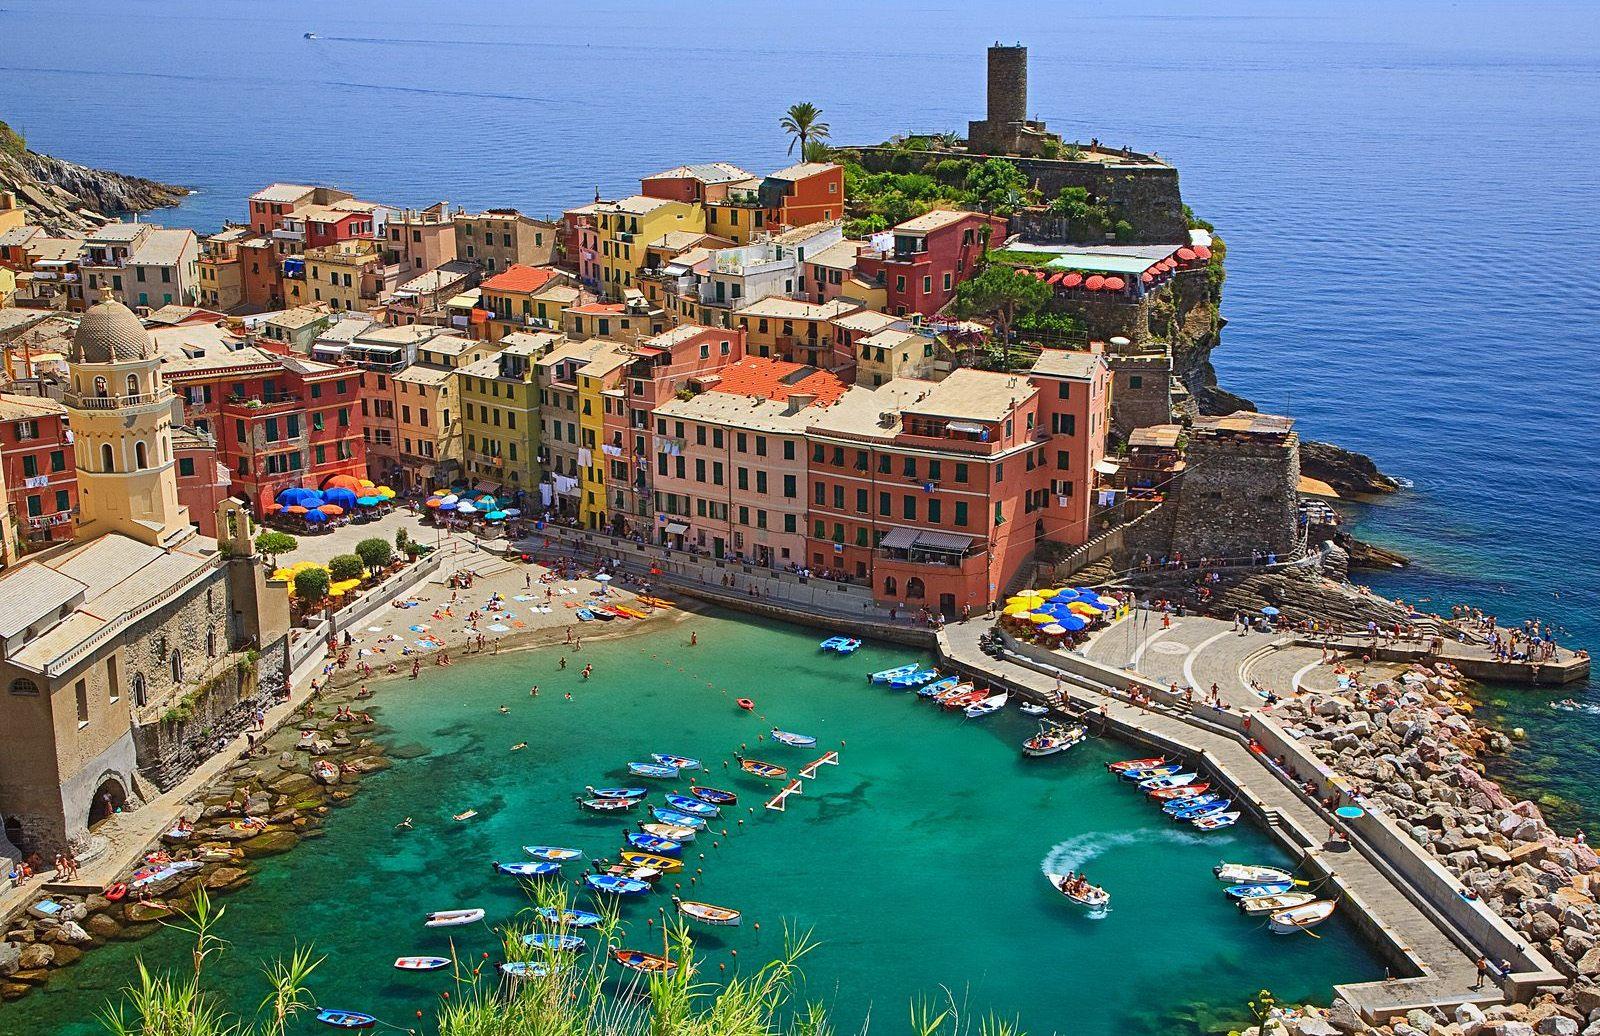 http://2.bp.blogspot.com/-psRhuHHVrvY/TwKyTqSz0HI/AAAAAAAAA80/lbp00Jej7yM/s1600/Vernazza-Cinque-Terre-Italy.jpg